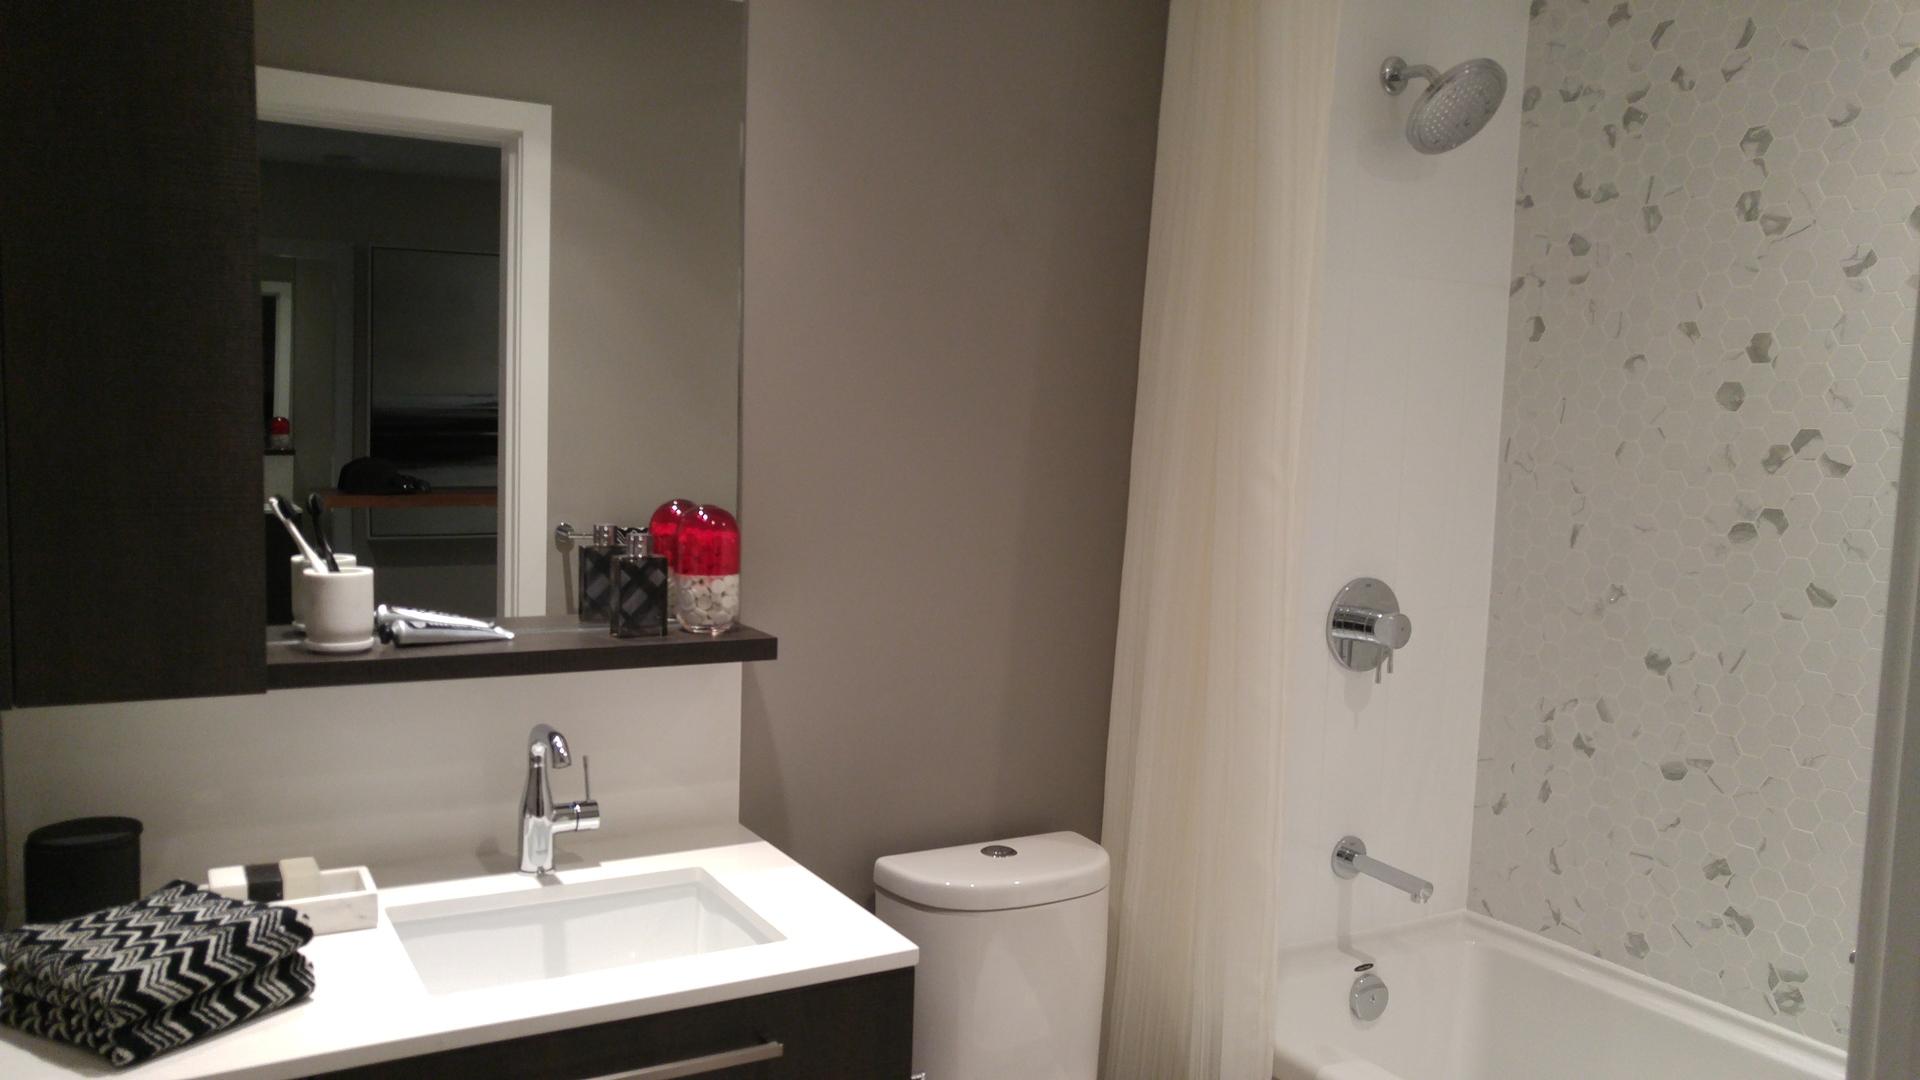 567-clarke-como-b-plan-bathroom-dark at 567 Clarke and Como (567 Clarke Road, Coquitlam West, Coquitlam)